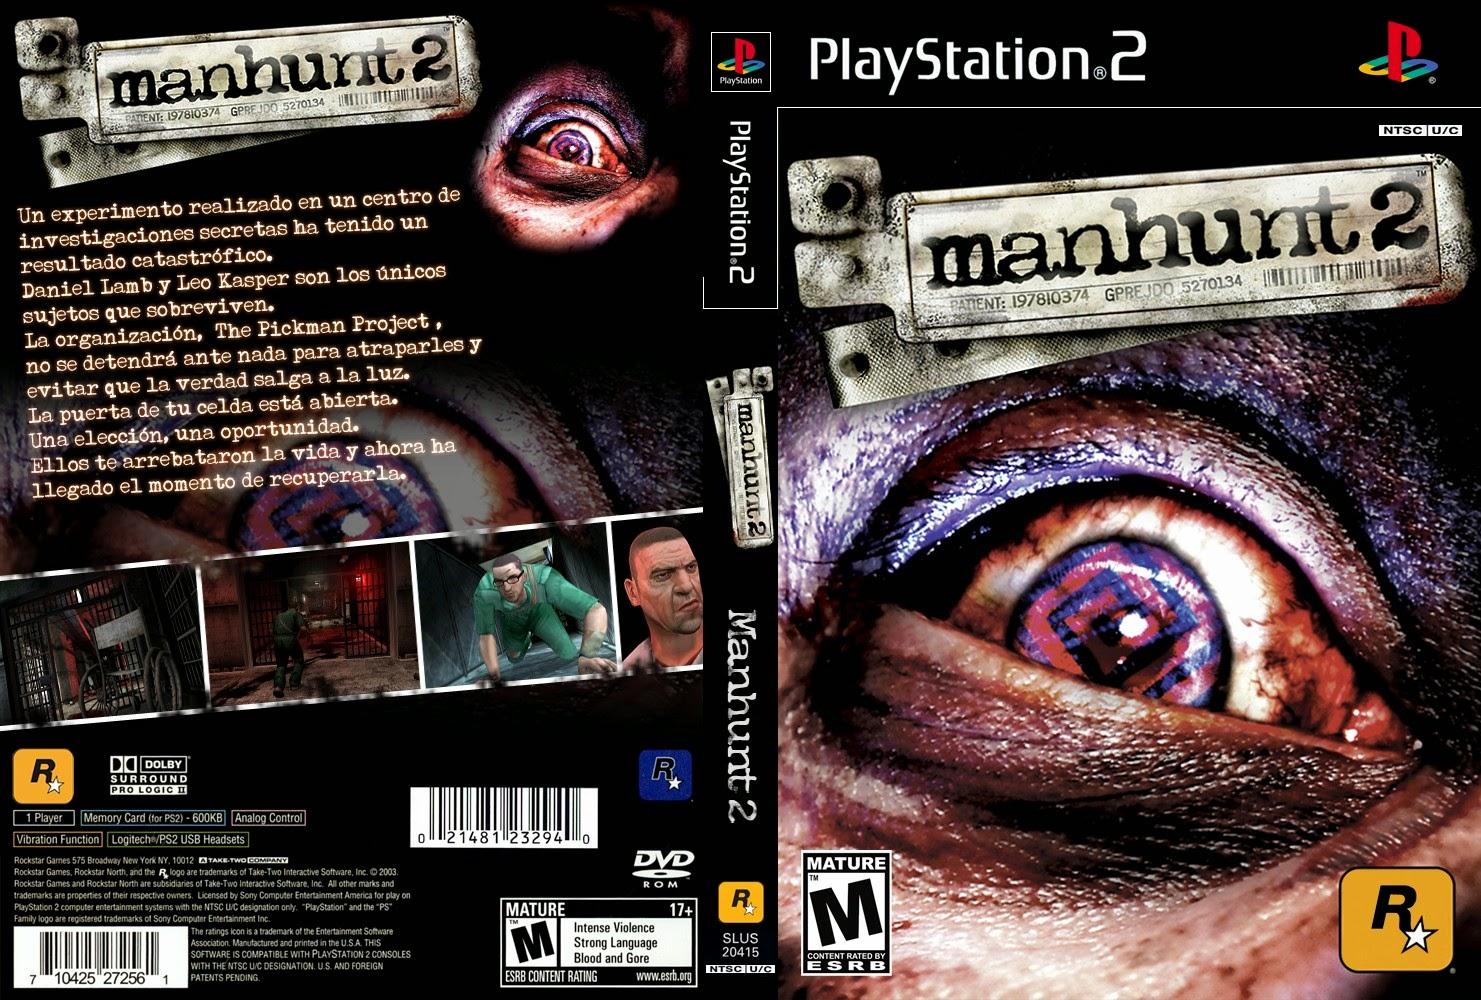 Manhunt mobile website